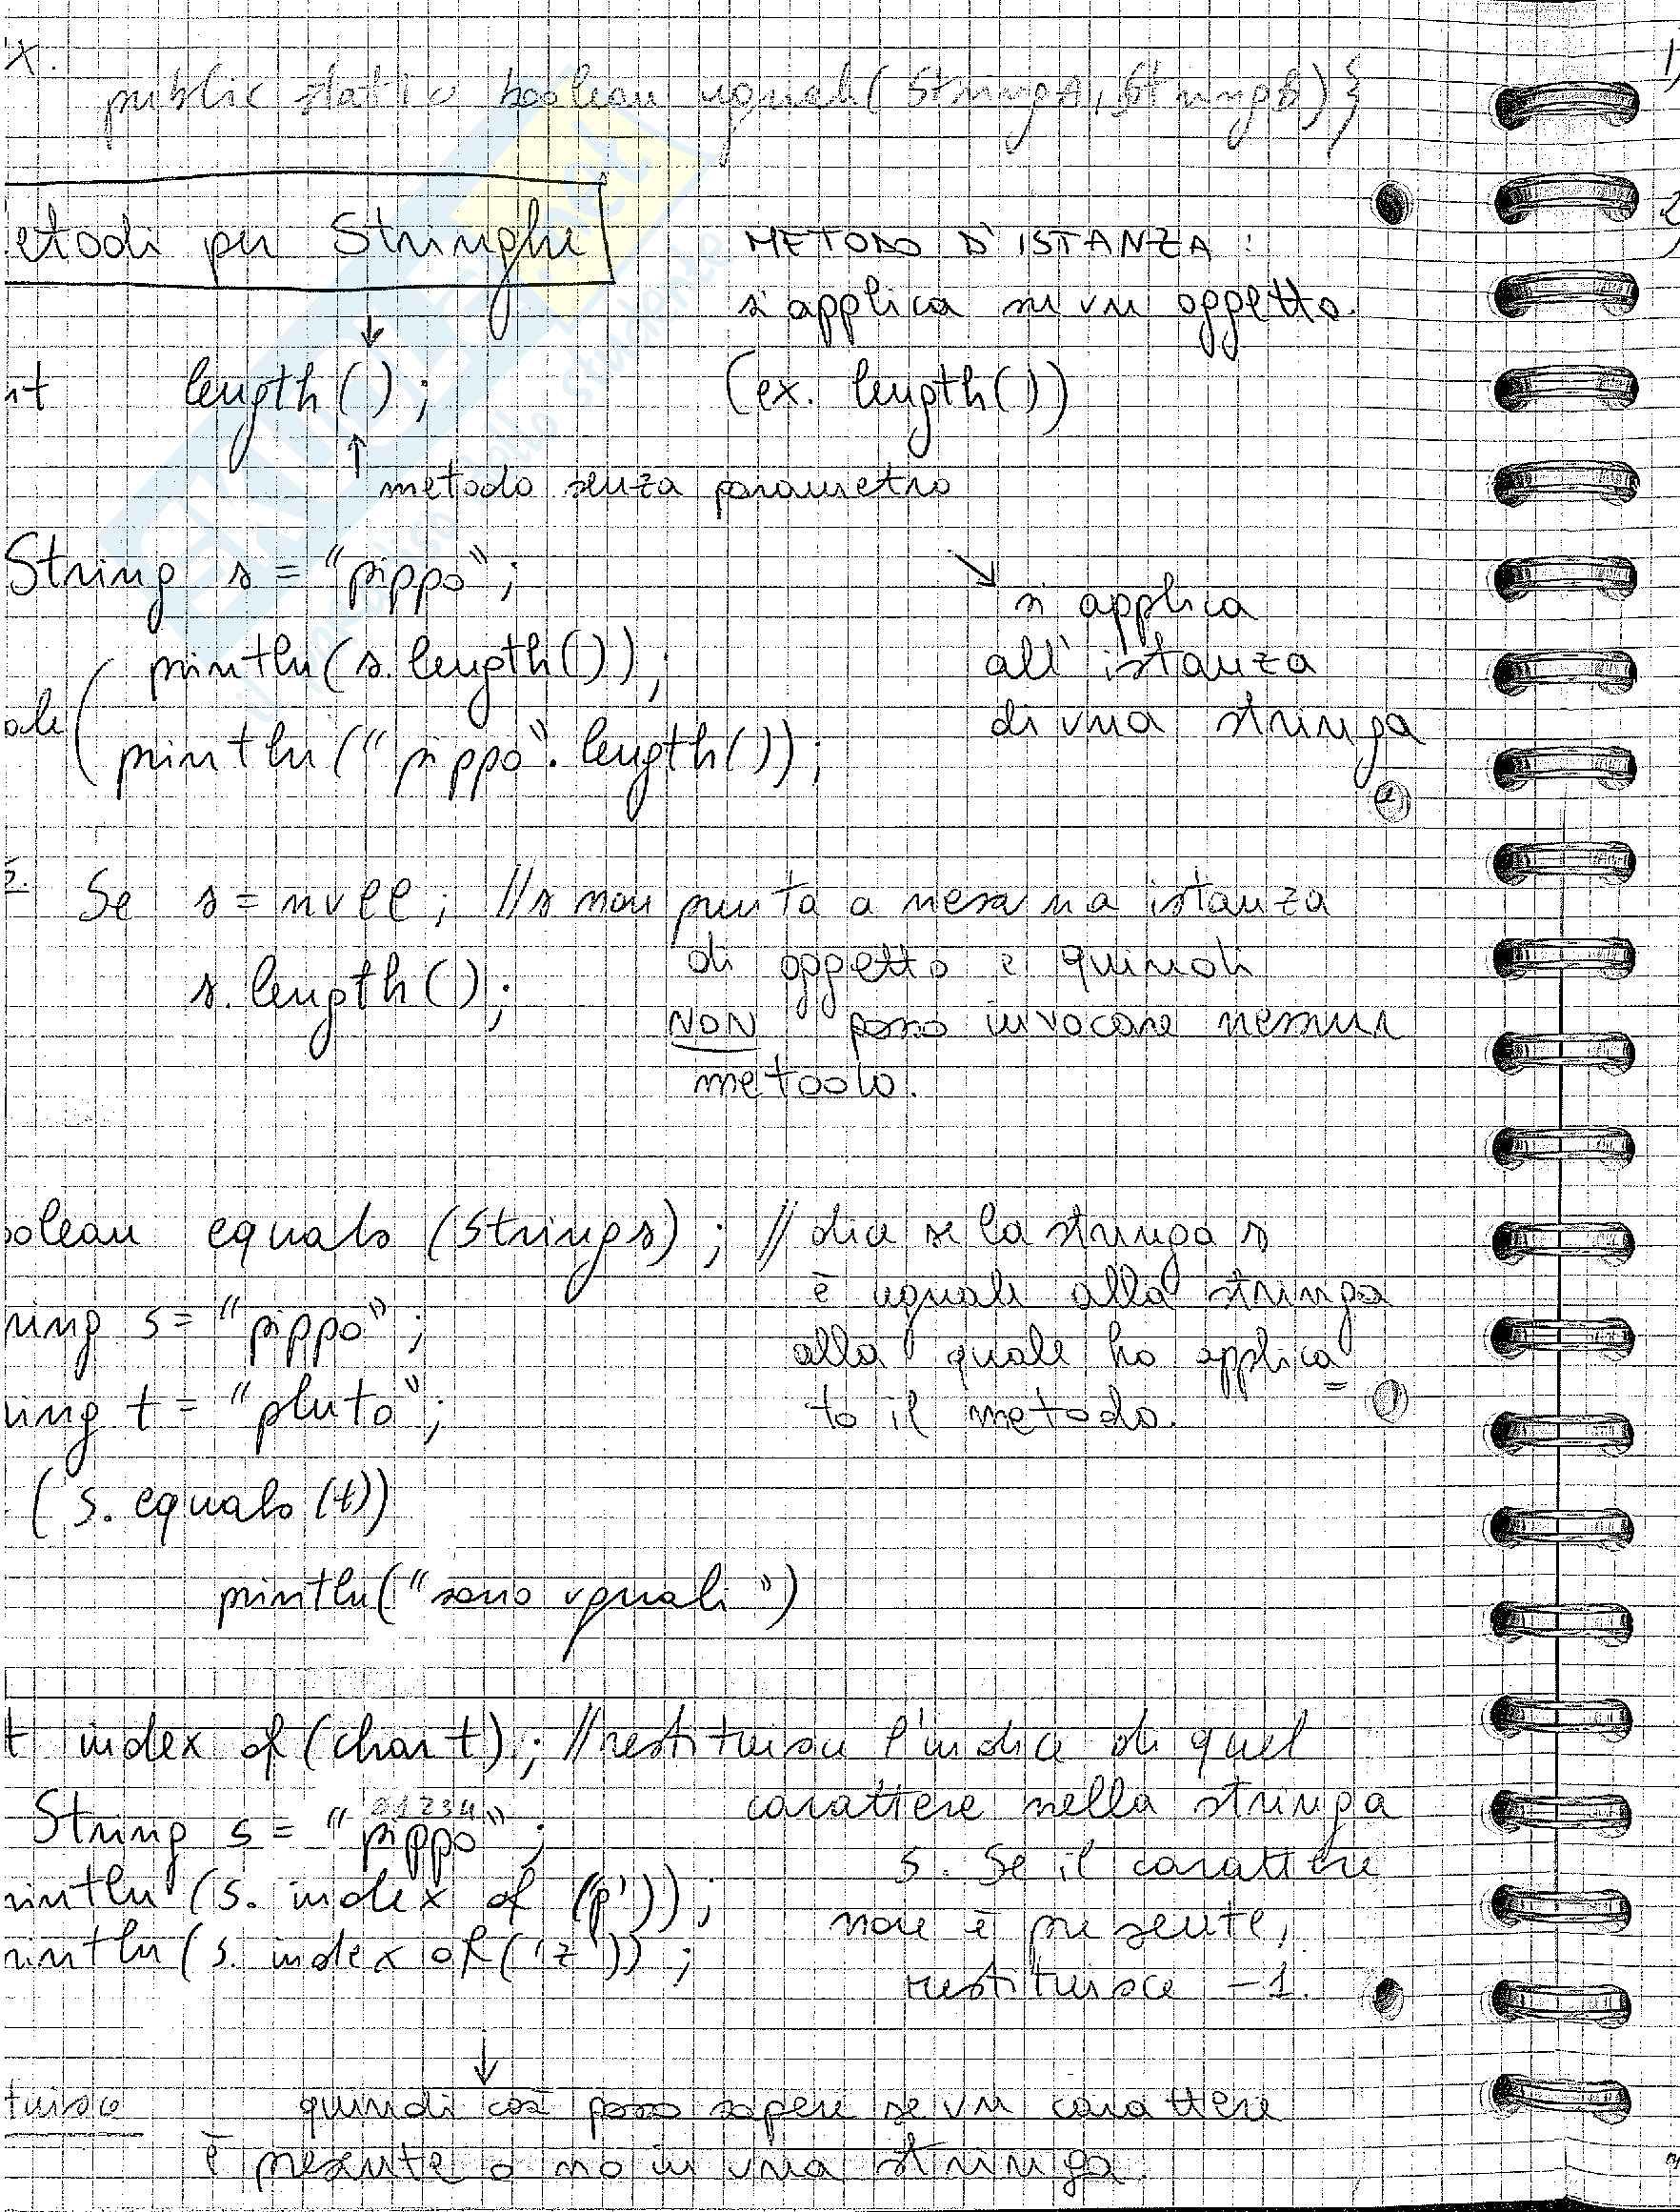 Appunti Informatica Pag. 101